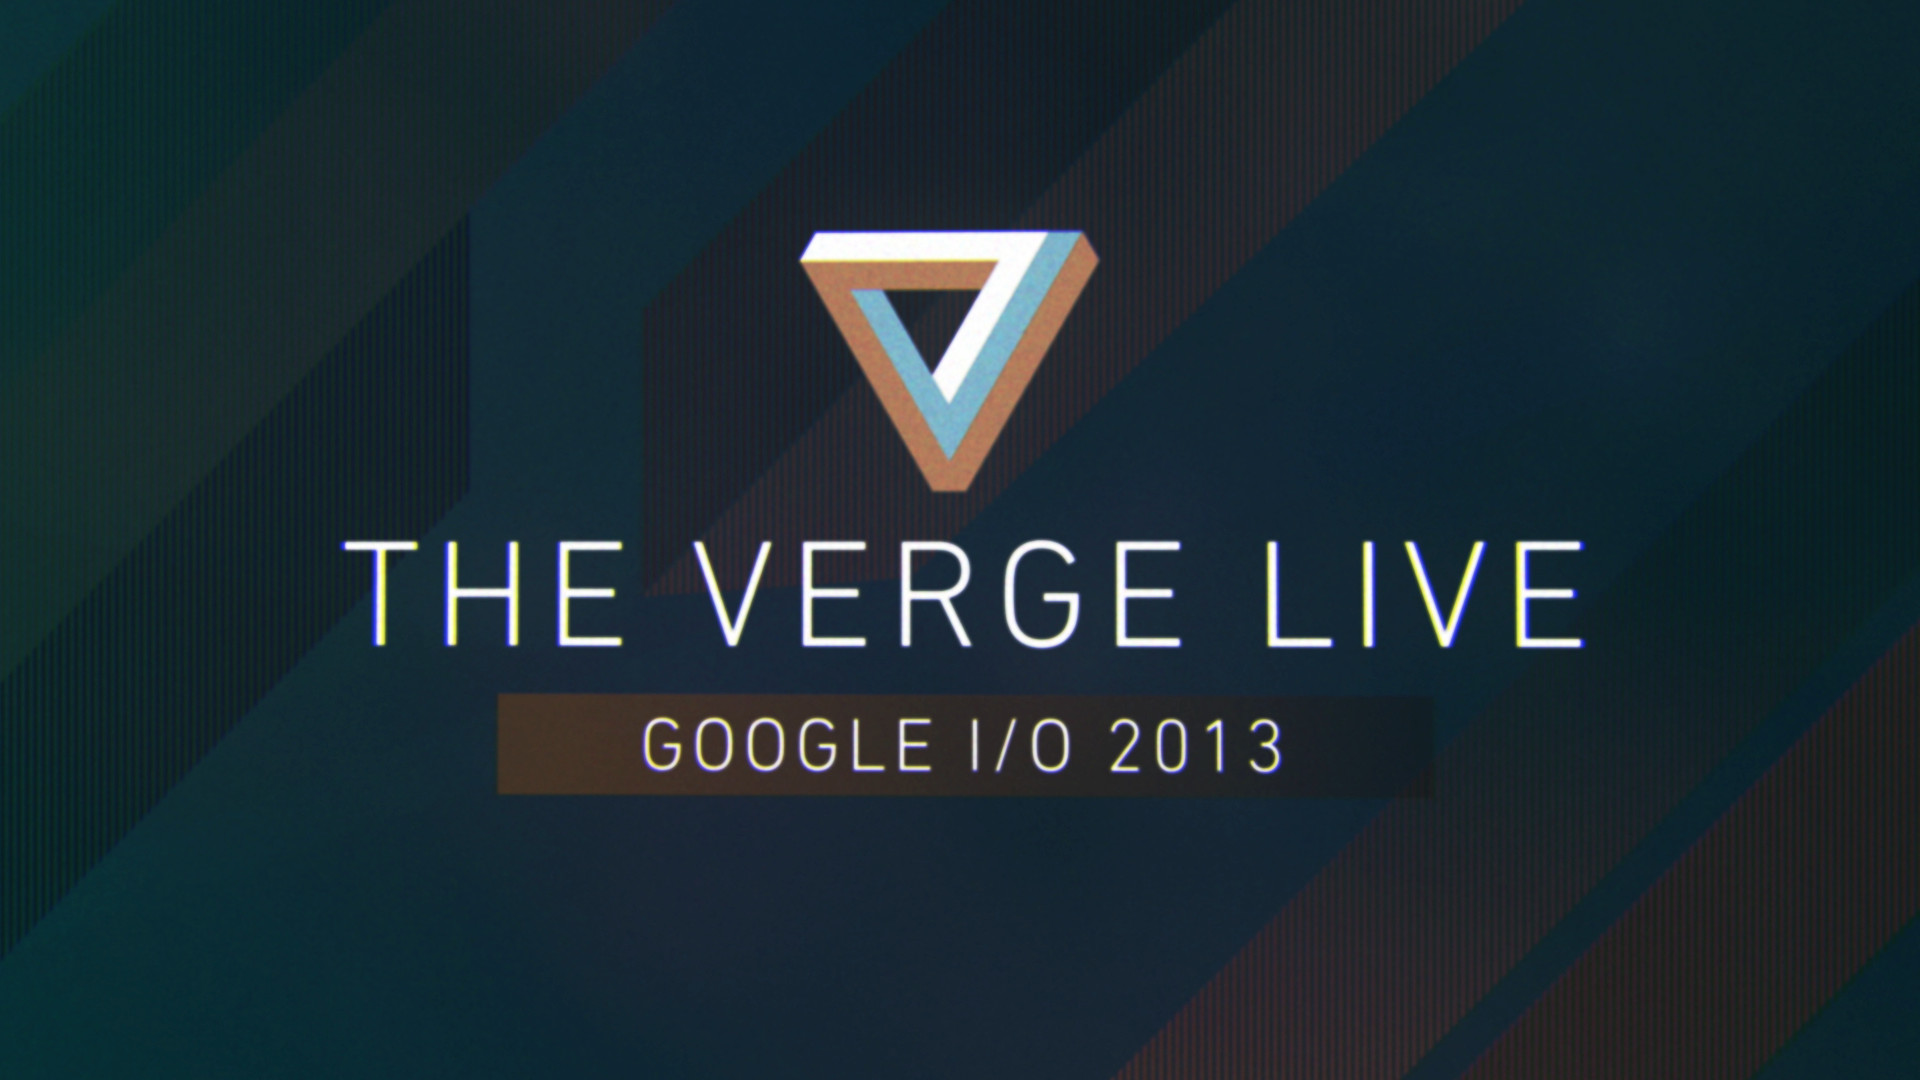 https://www theverge com/2013/5/9/4316260/the-vergecast